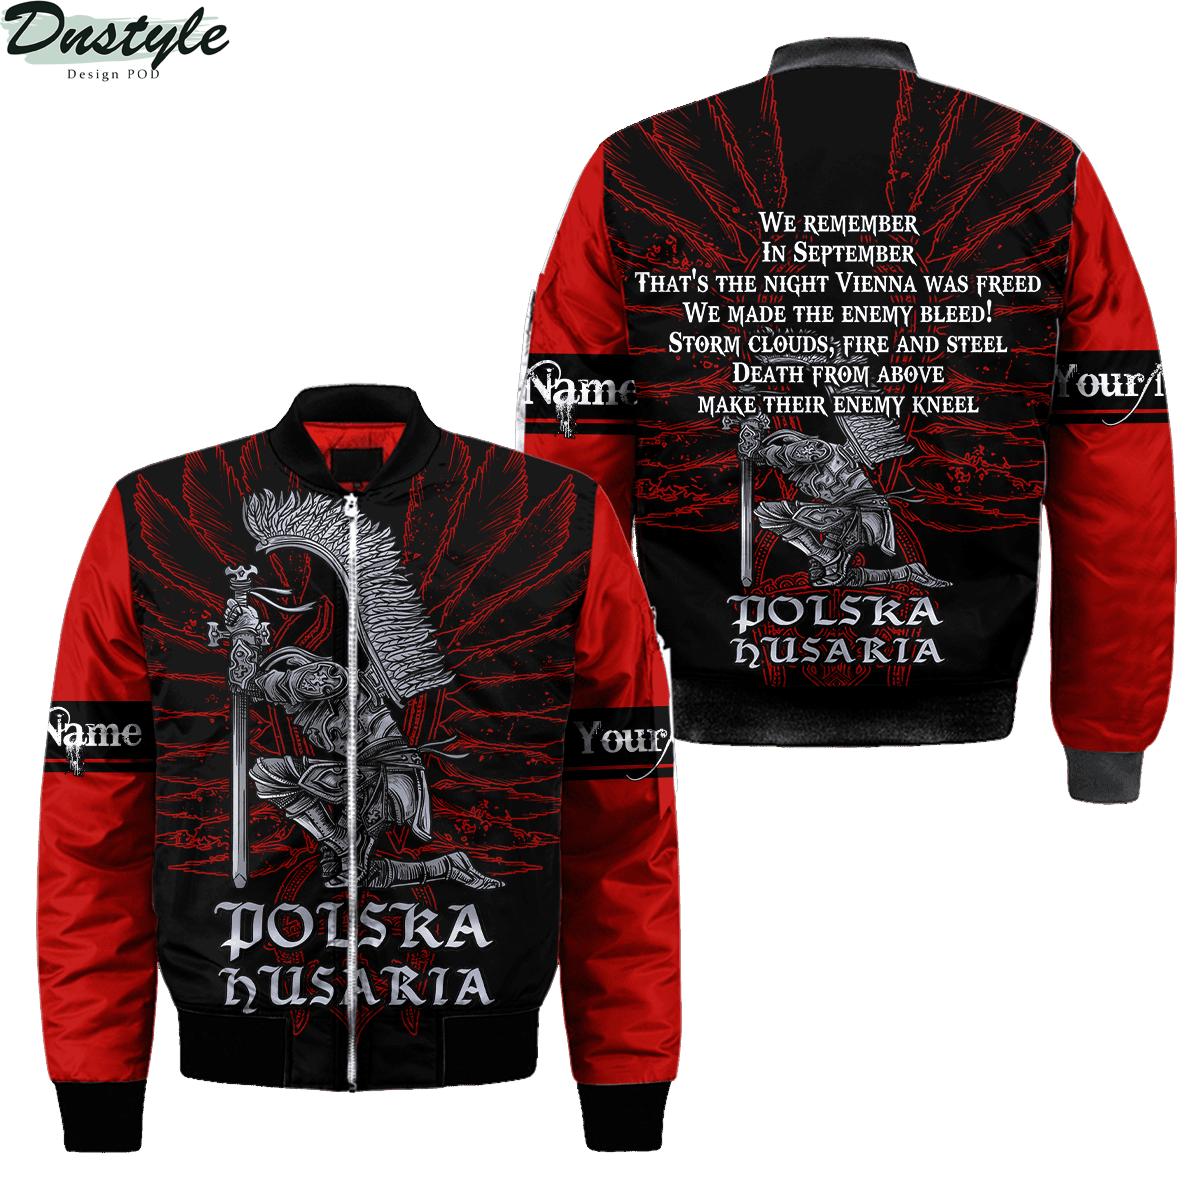 Personalized custom name polska husaria 3d all over printed bomber jacket